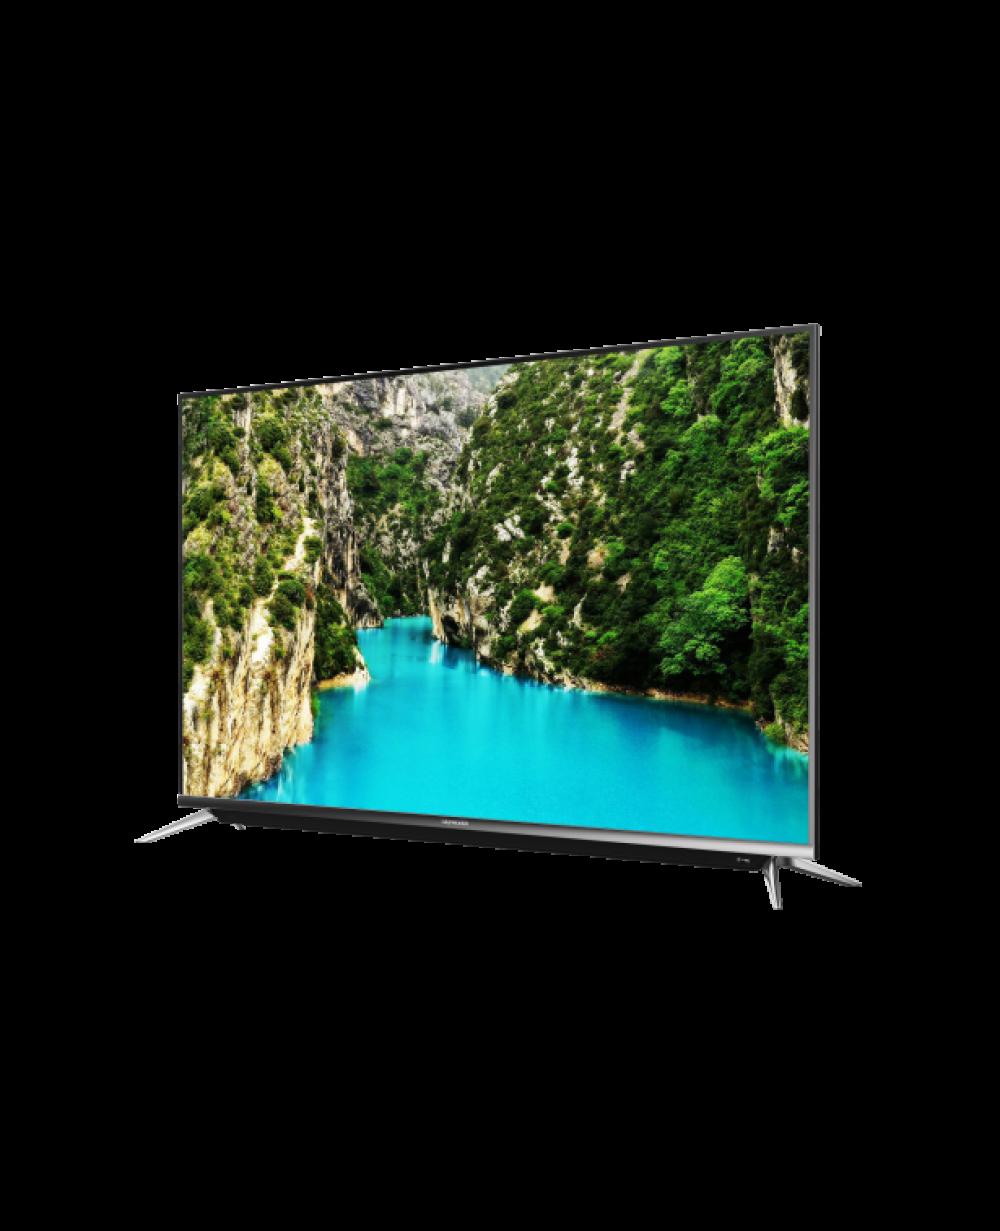 Skyworth 49G6 - 49 inch 4K Ultra HD Smart LED TV